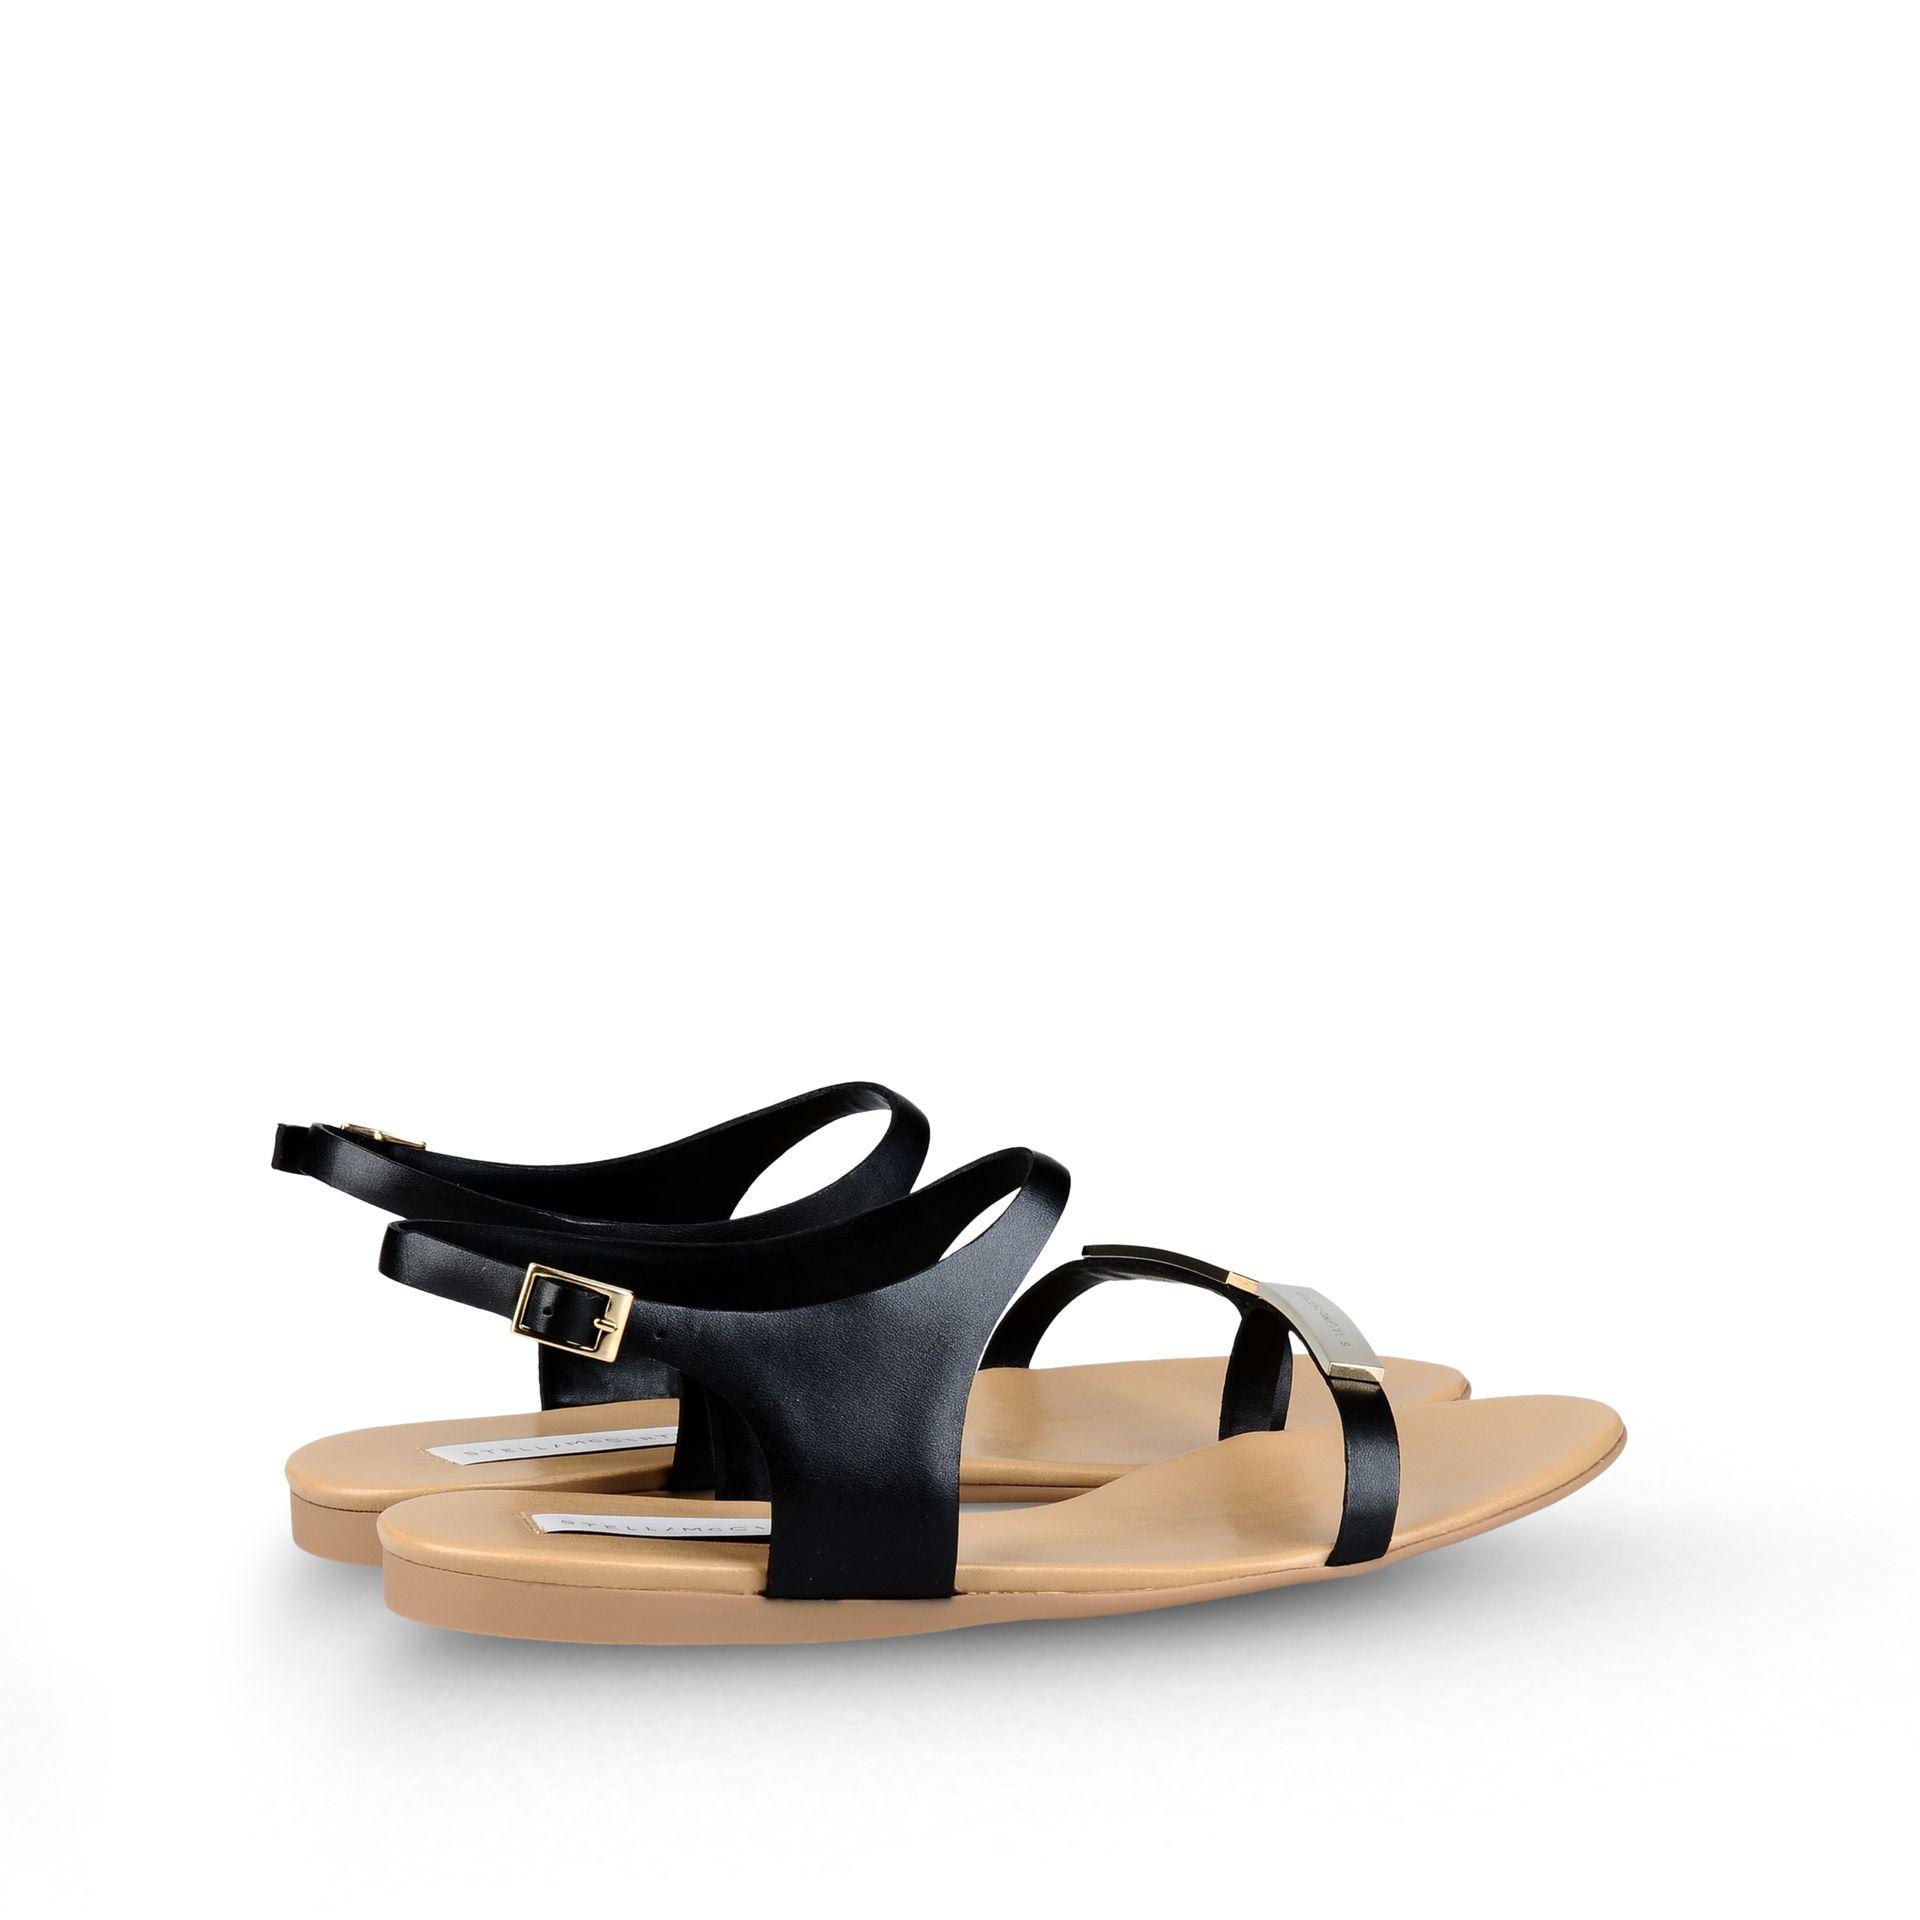 Stella McCartney Bicolor sandals Free Shipping Real Latest Sale Online Shopping Online High Quality Sale Shop Offer Sale Footlocker MbRdTF